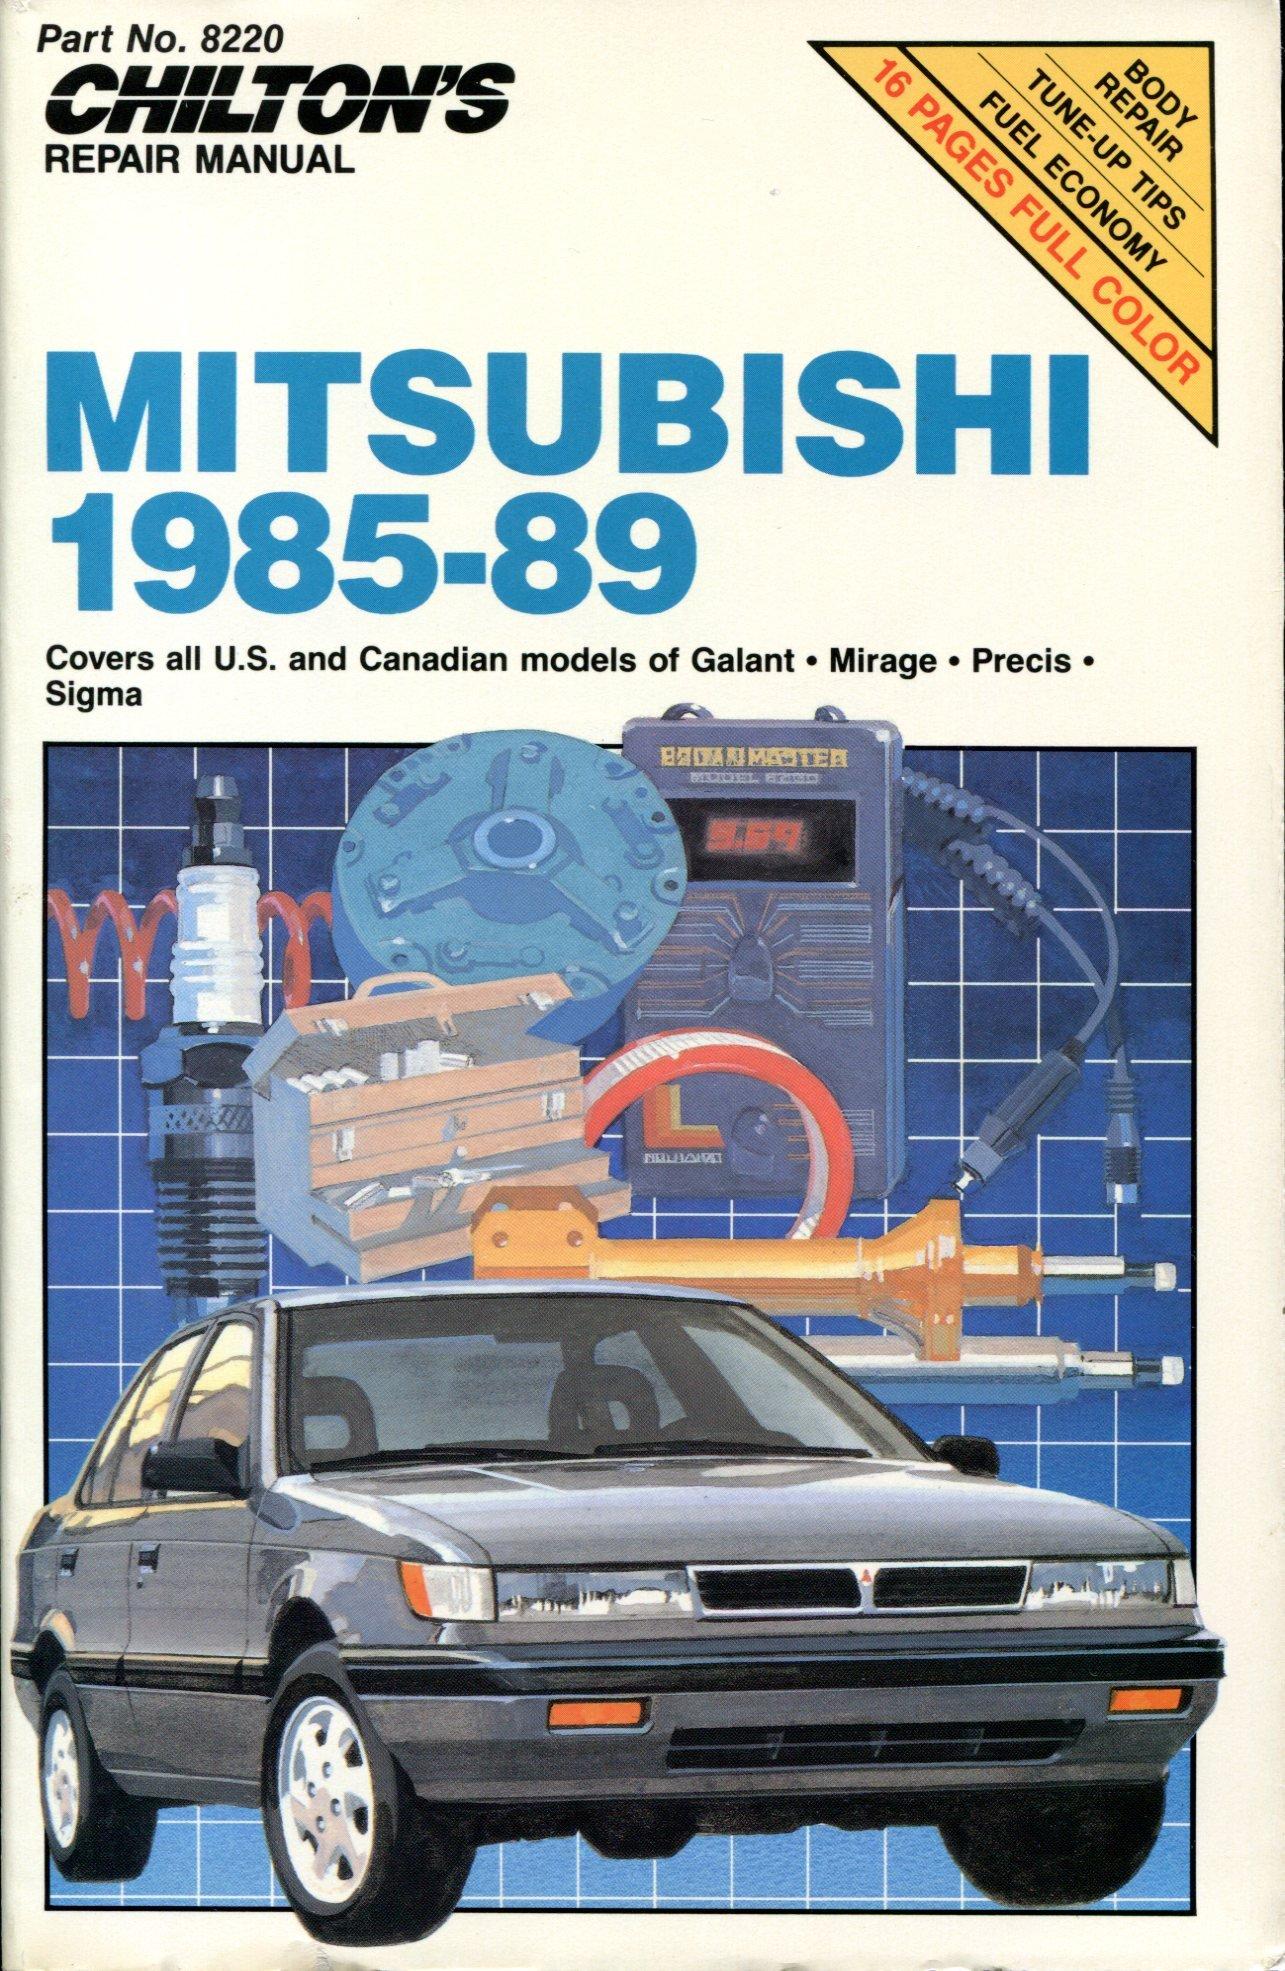 Chilton's Repair Manual: Mitsubishi 1985-89 : Covers All U.S. and Canadian  Models of Galant, Mirage, Precis, Sigma: Chilton Book Company:  9780801982200: ...